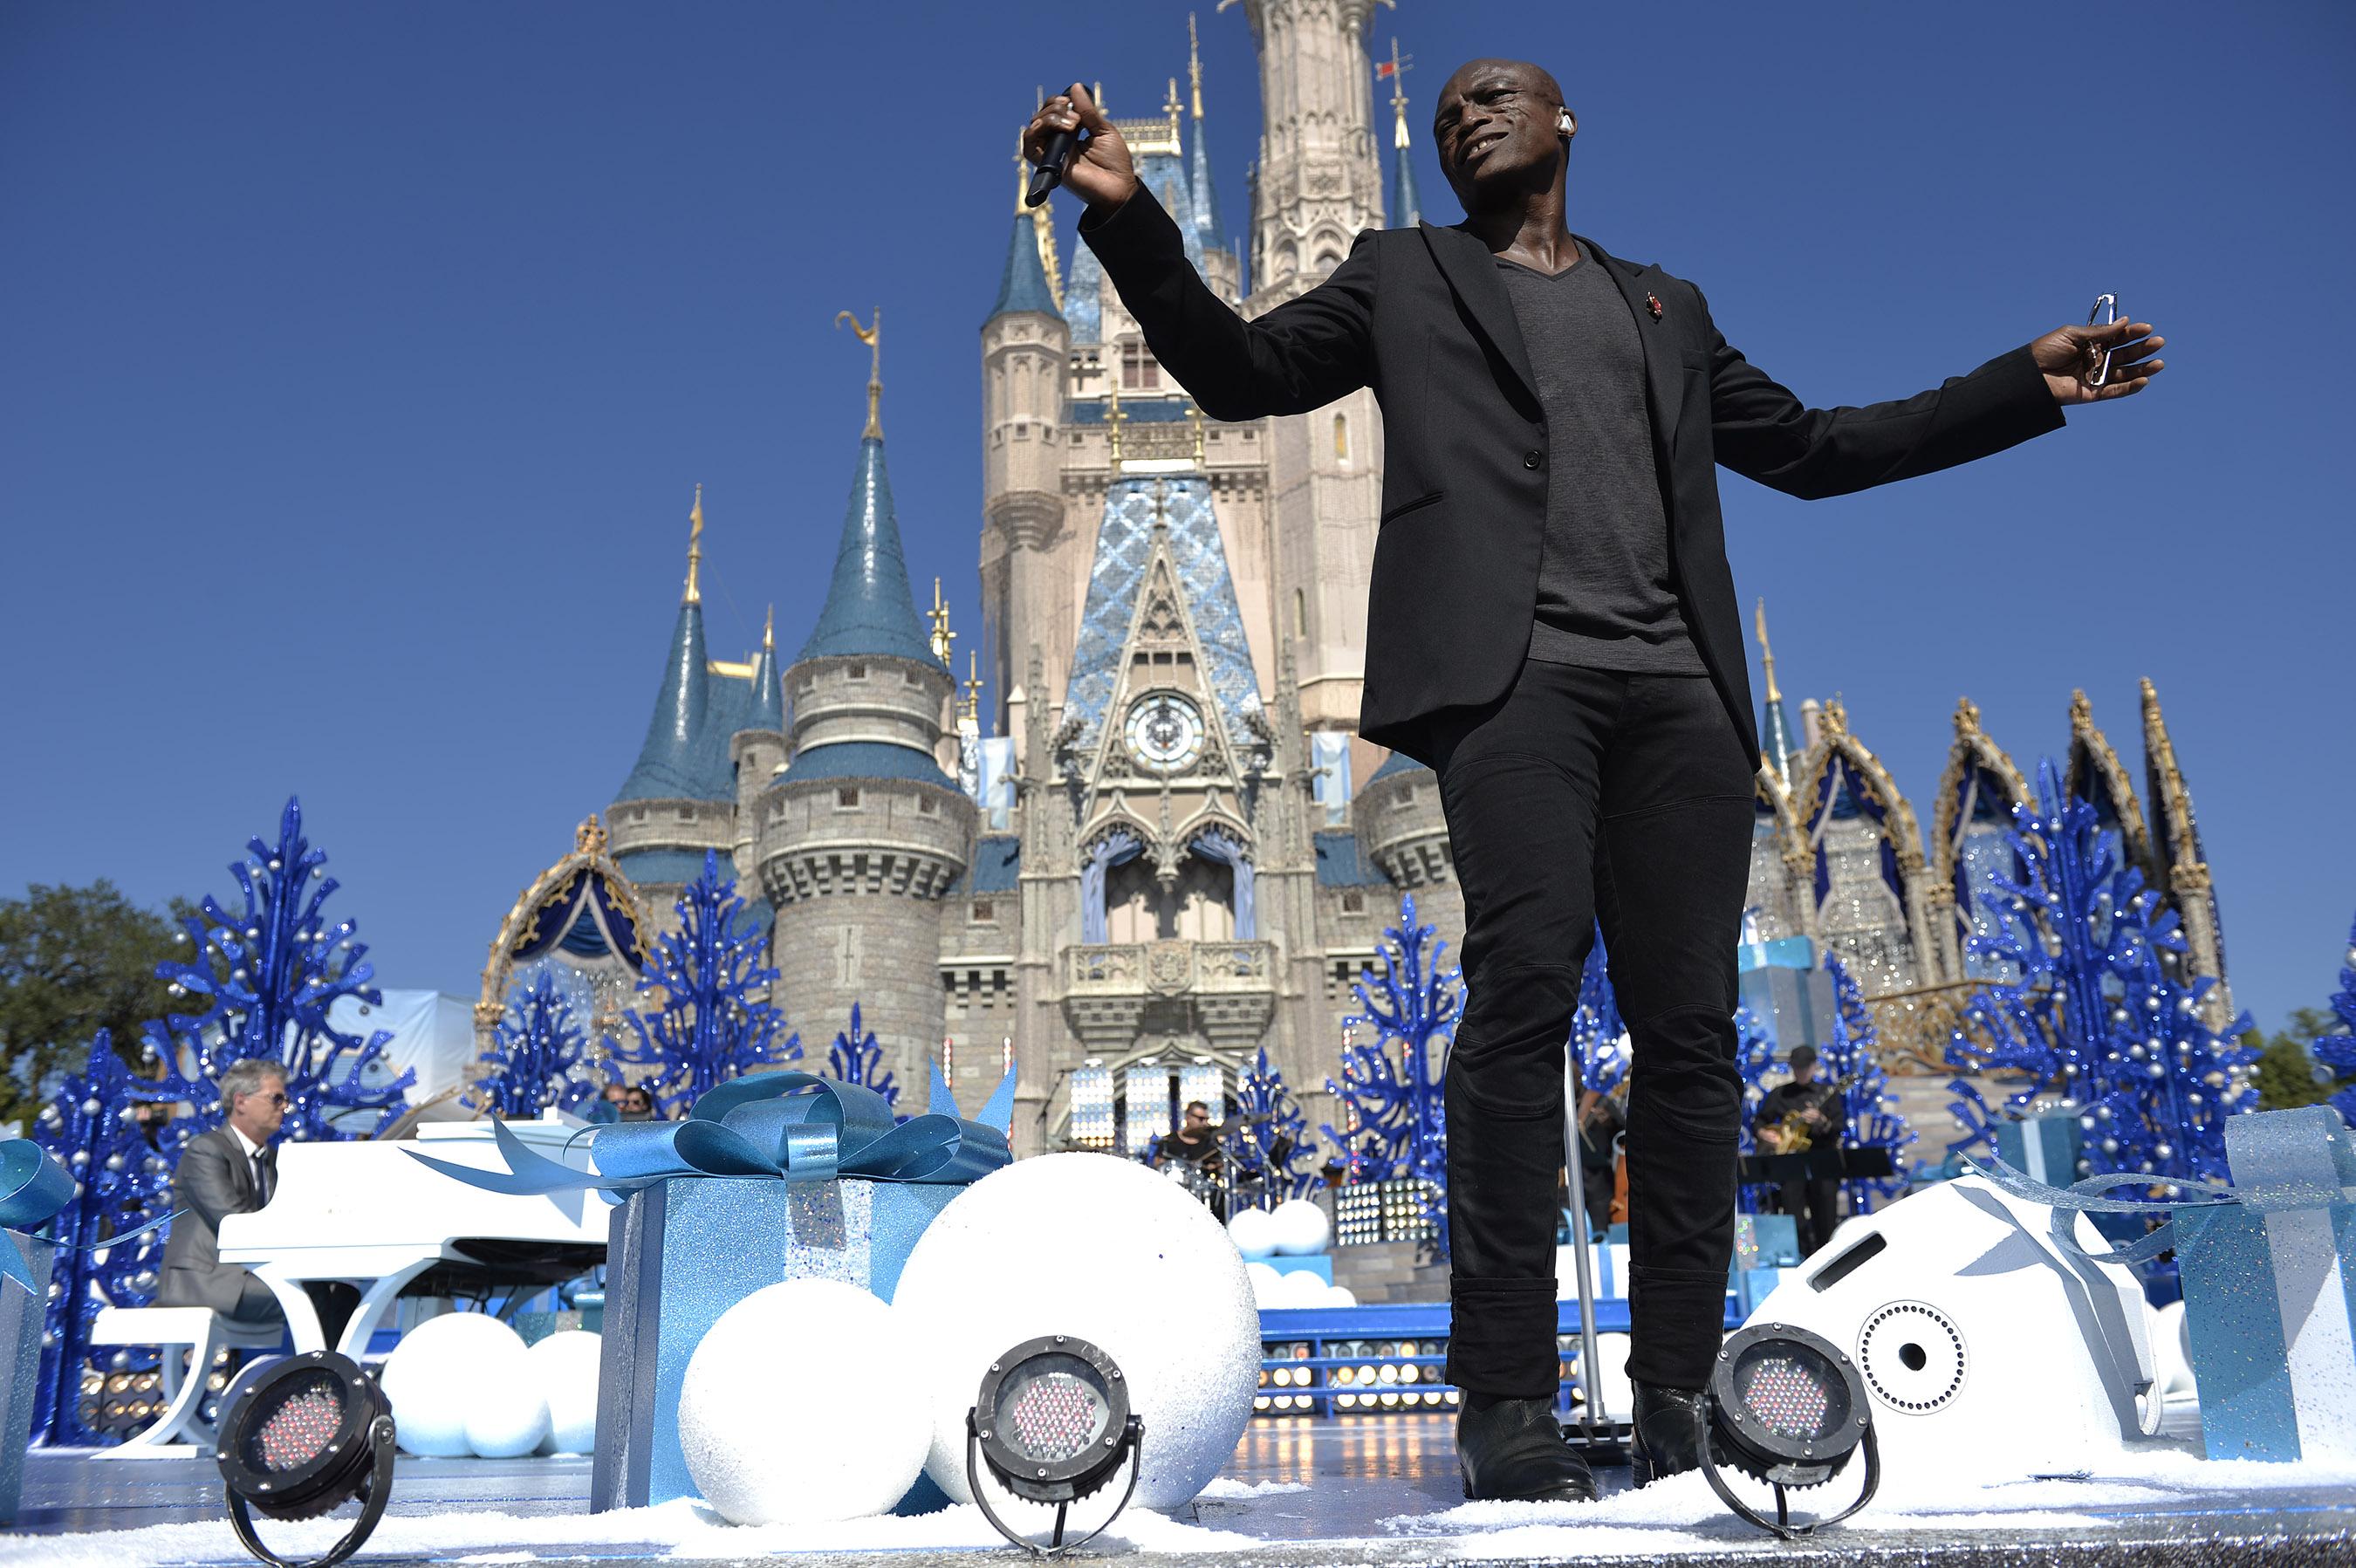 Disney Parks Unforgettable Christmas Celebration performance - Seal